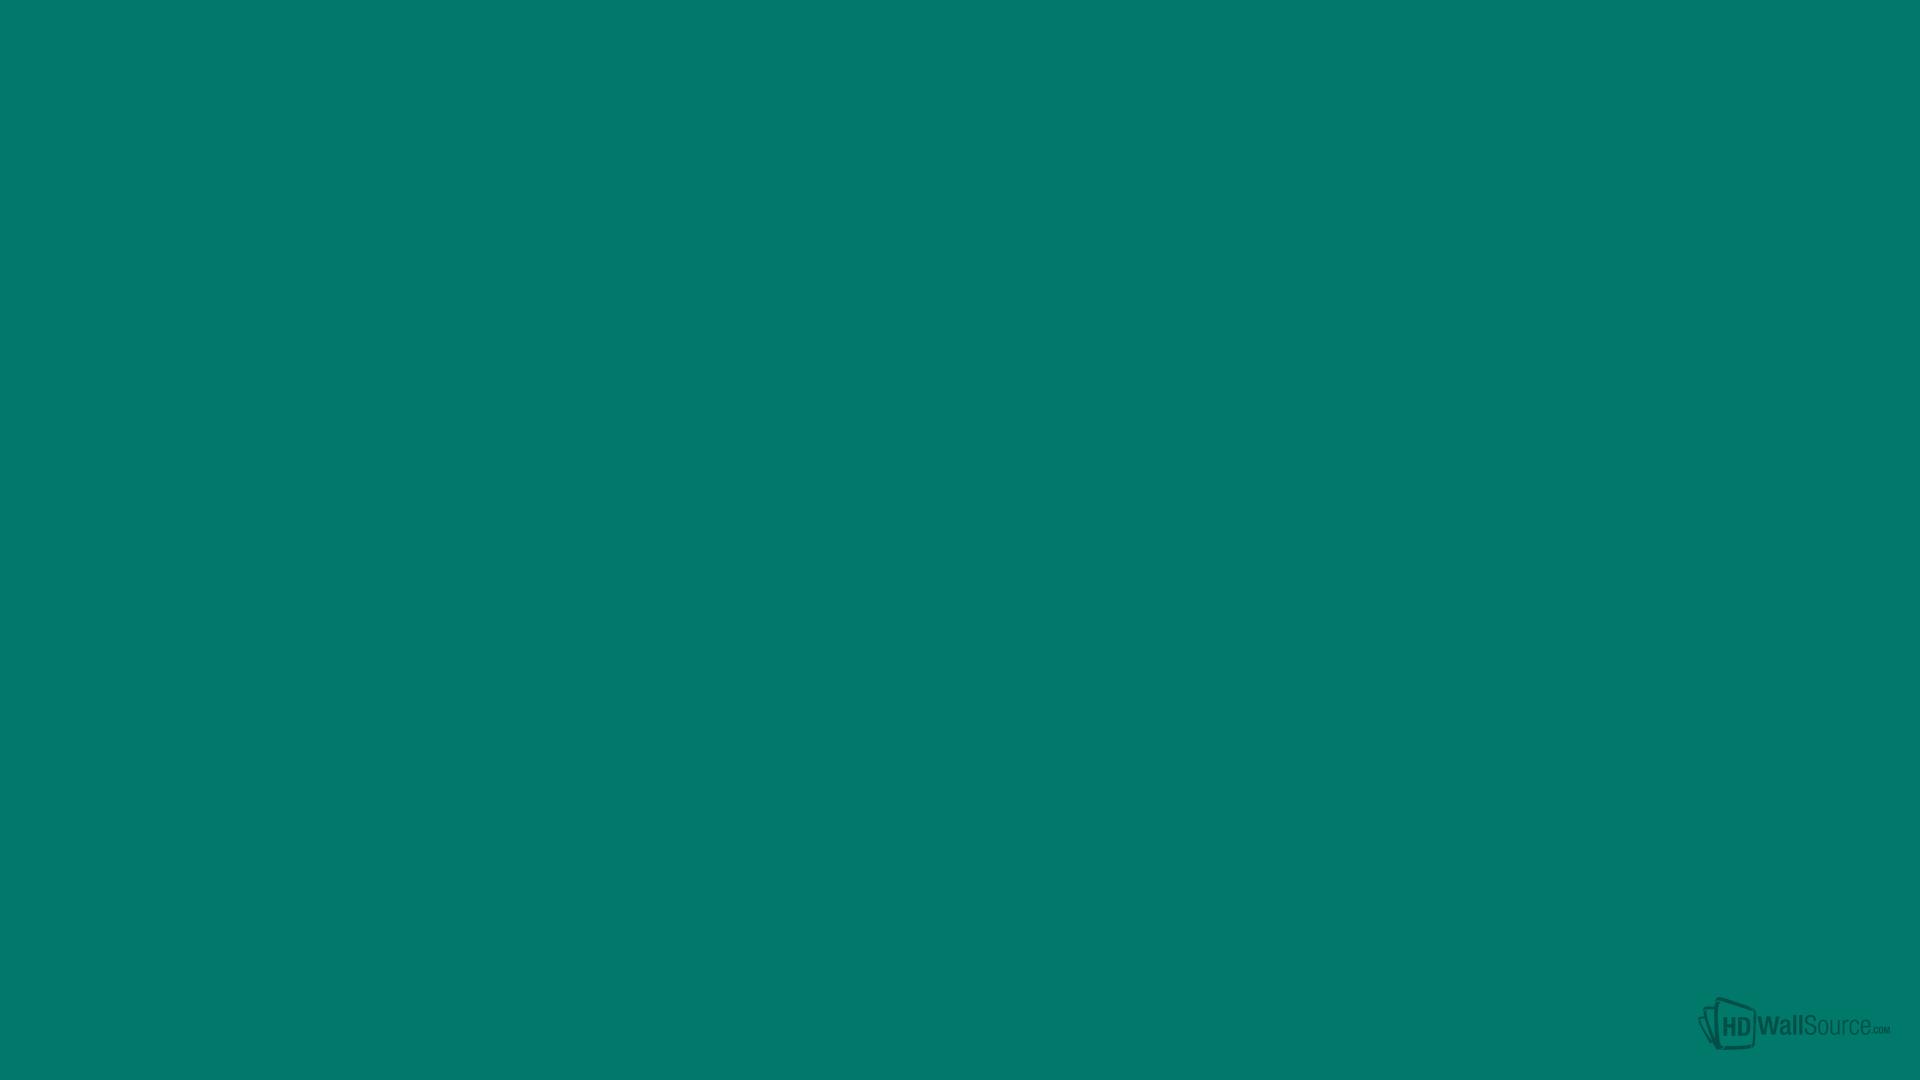 00796b wallpaper 70561